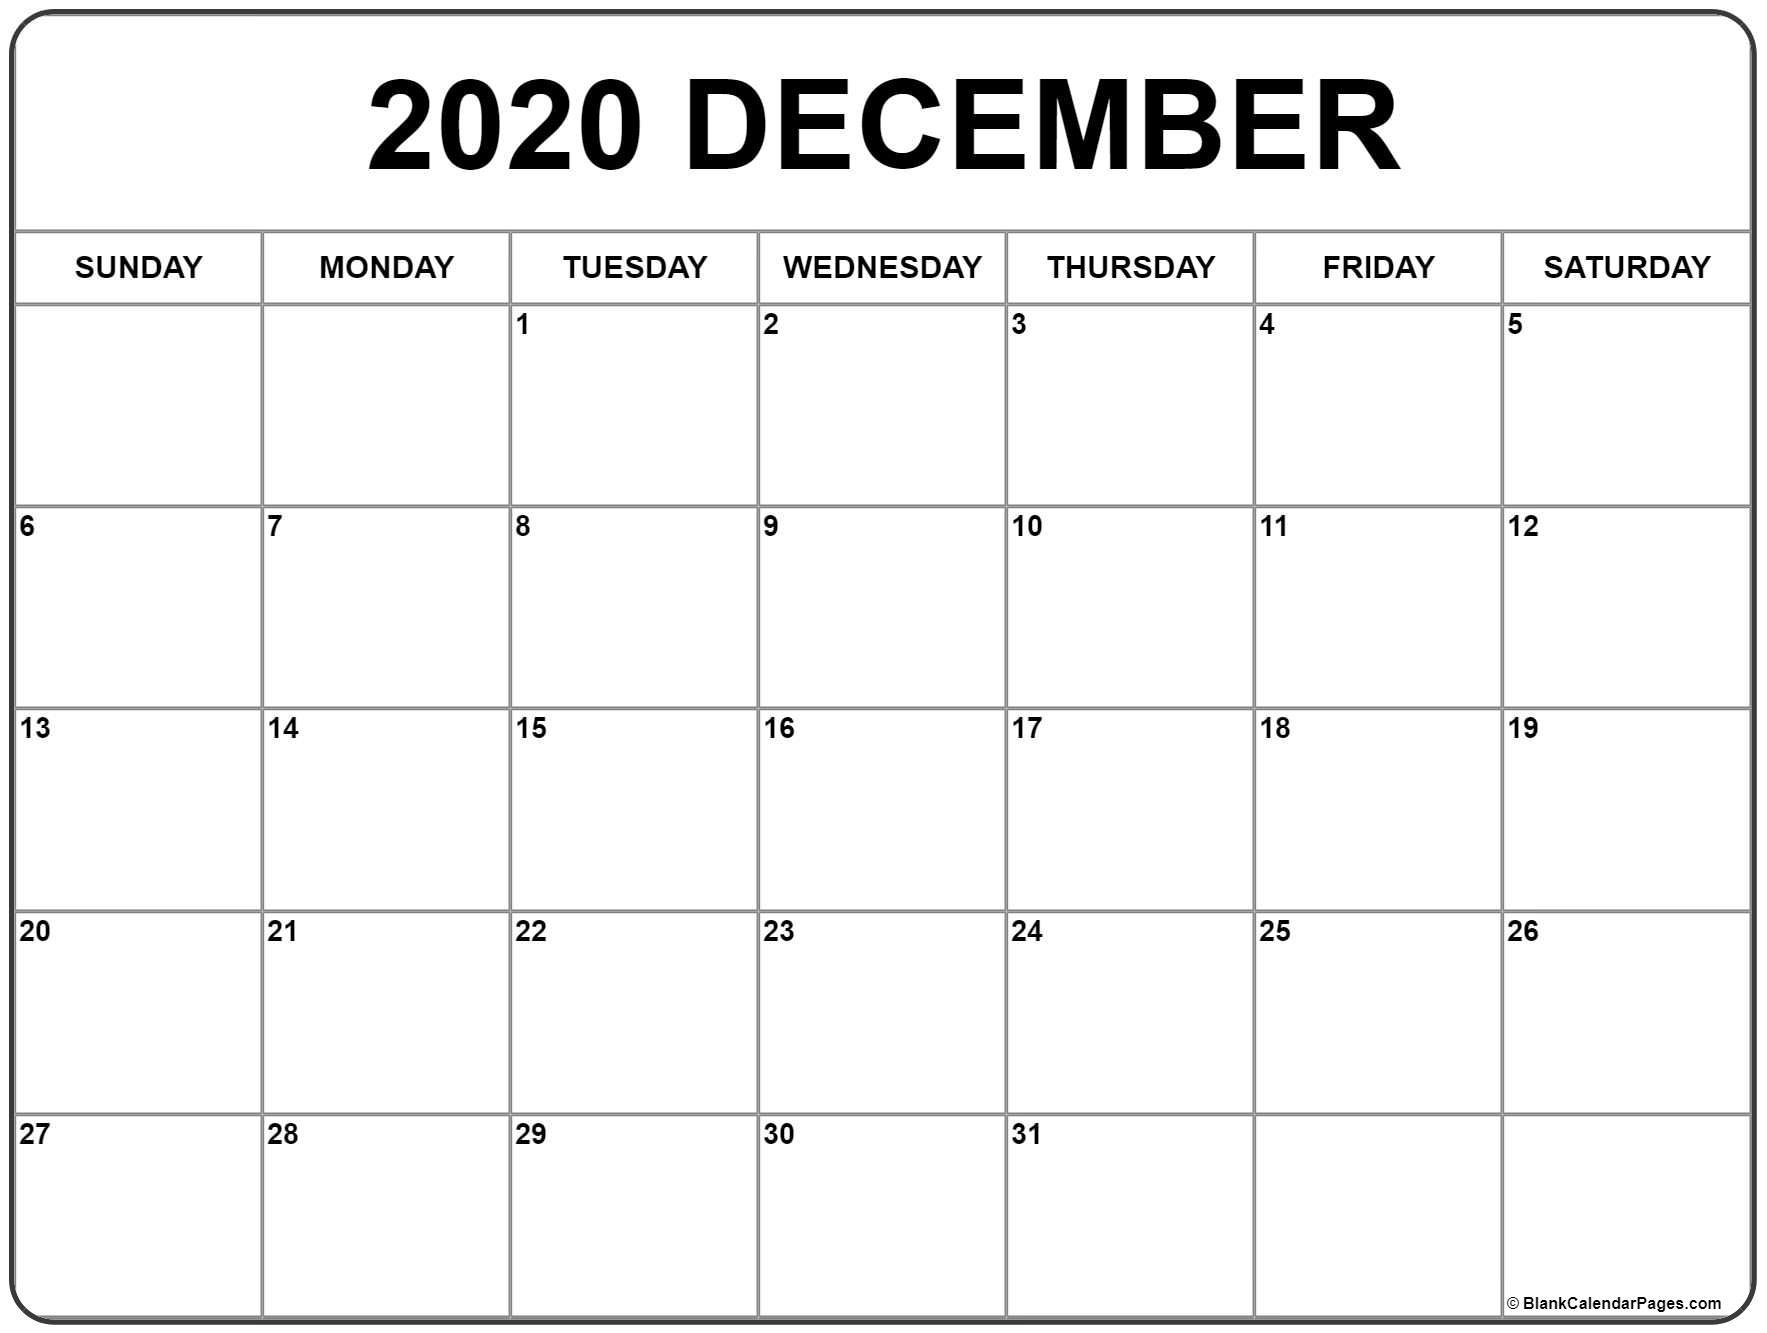 Blank Dec 2020 Calendar - Togo.wpart.co